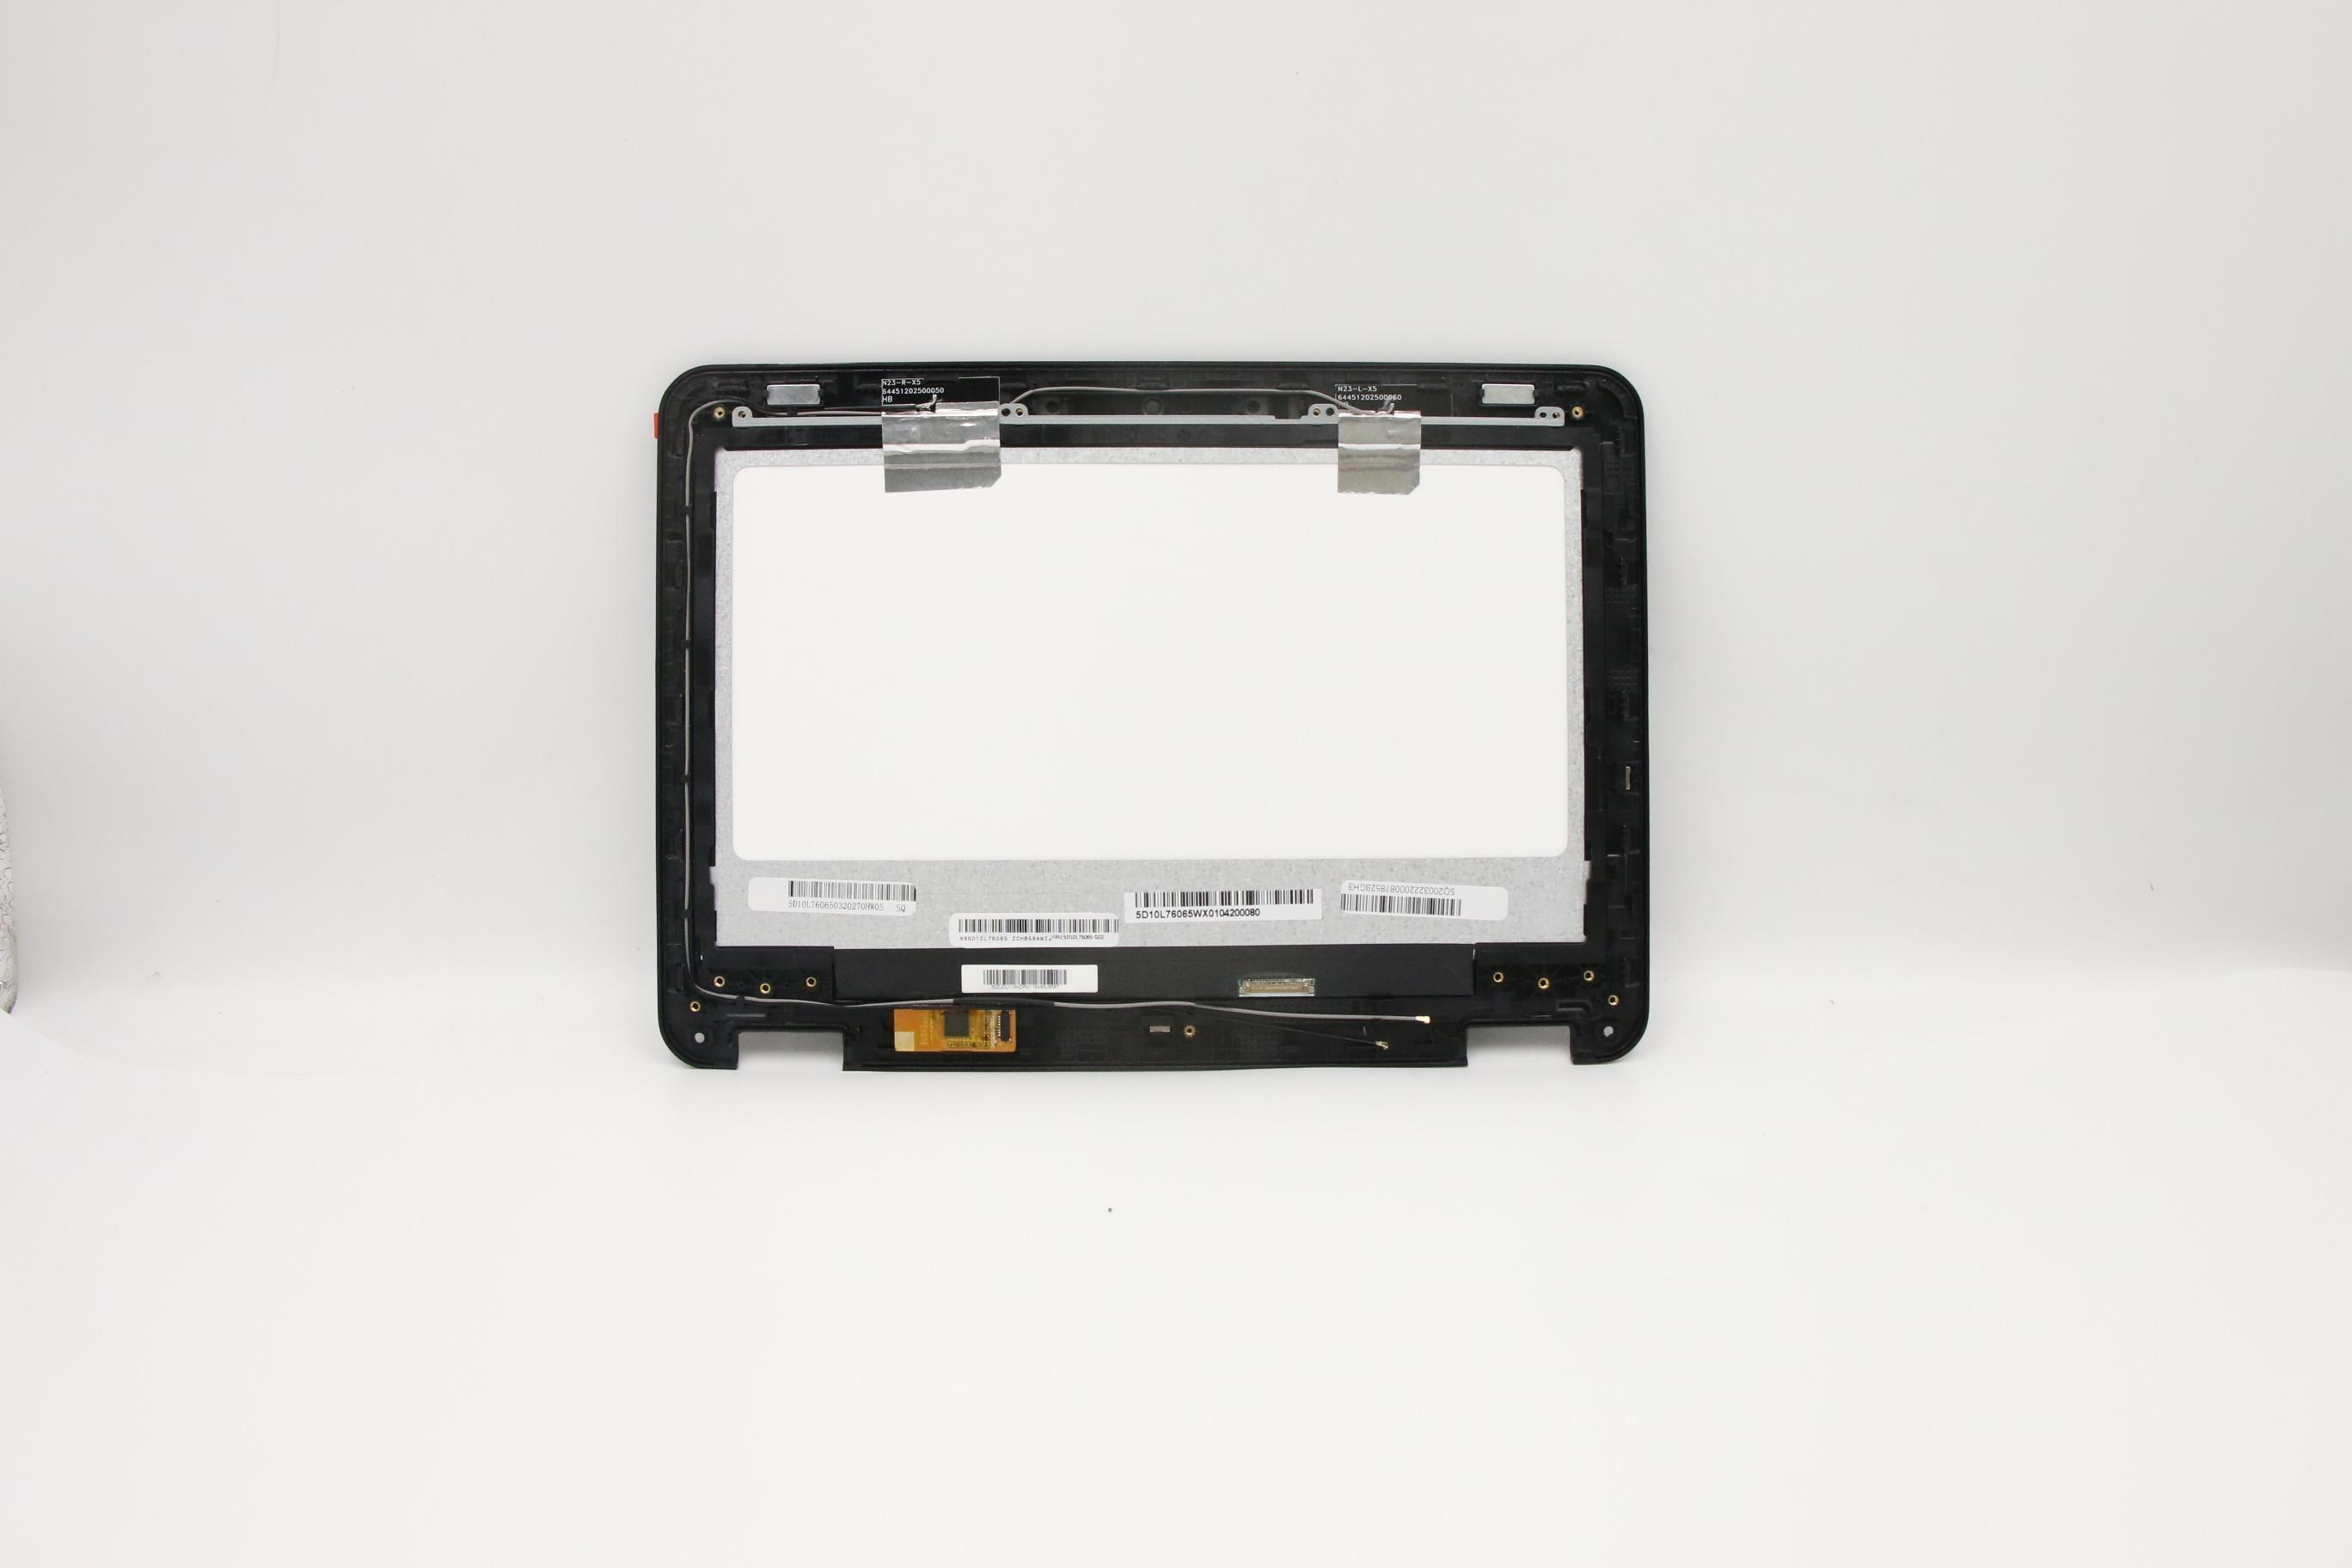 Aplicar a lenovo winbook N23 LCD LED pantalla táctil Panel digitalizador pantalla 5D10L76065